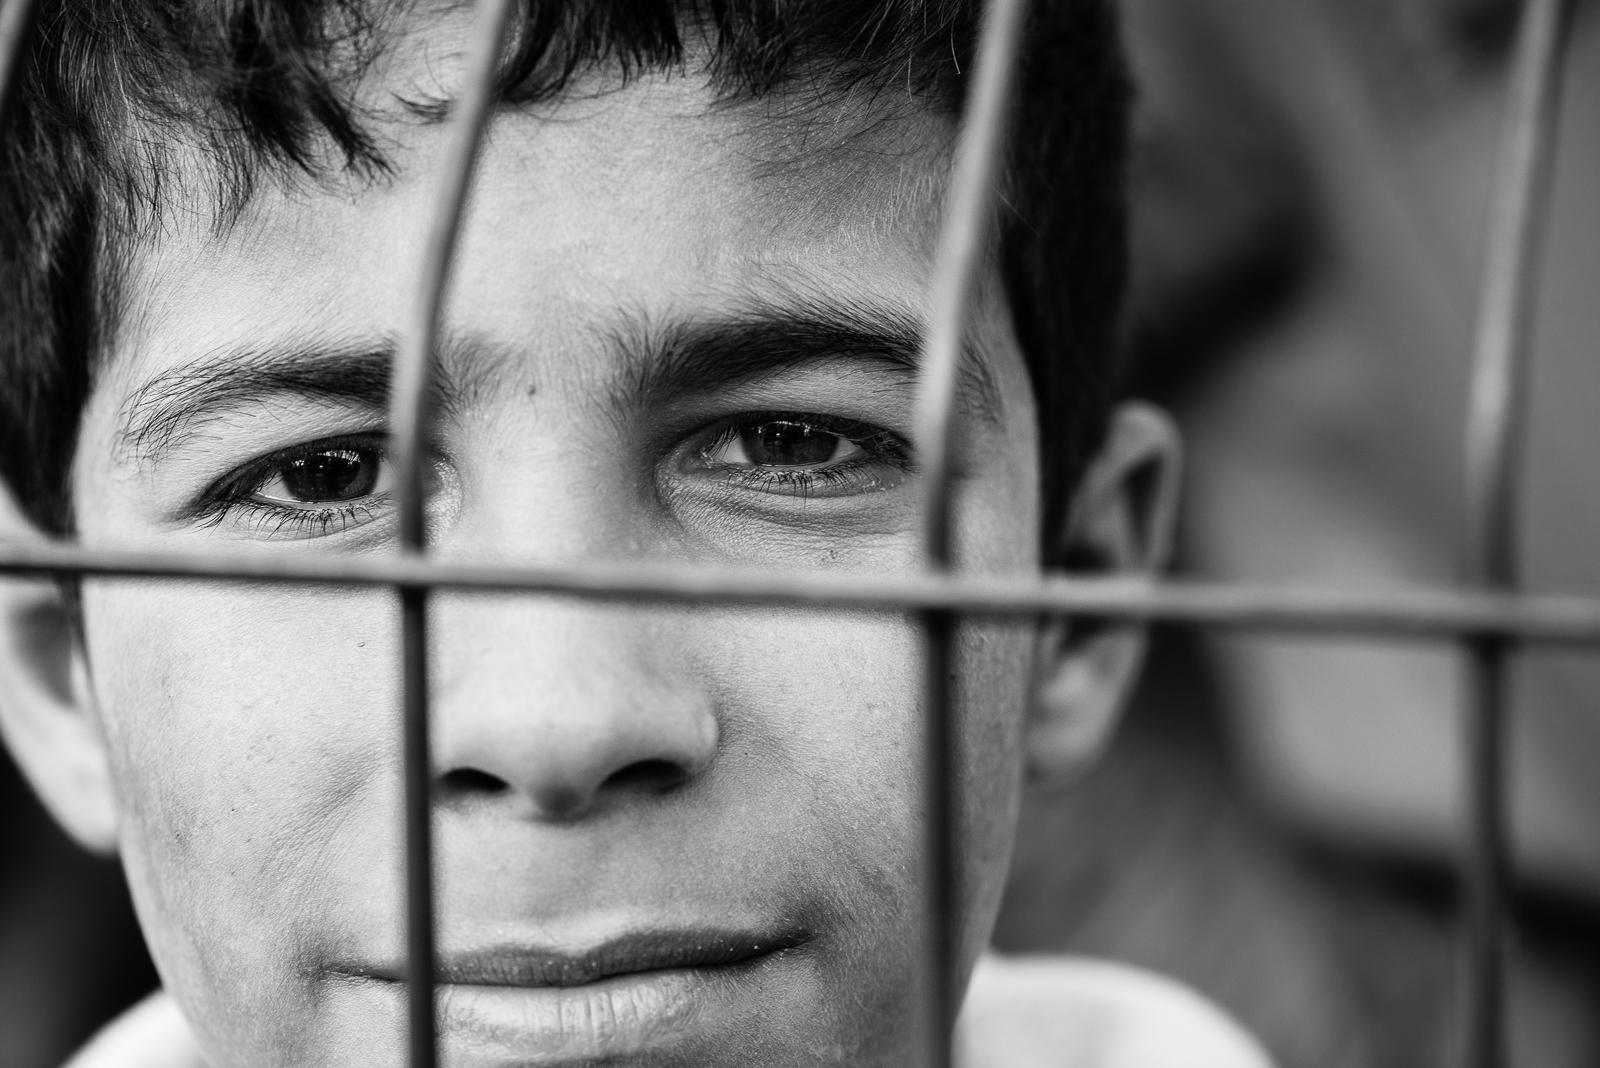 The gaze of a little syrian boy inside a camp